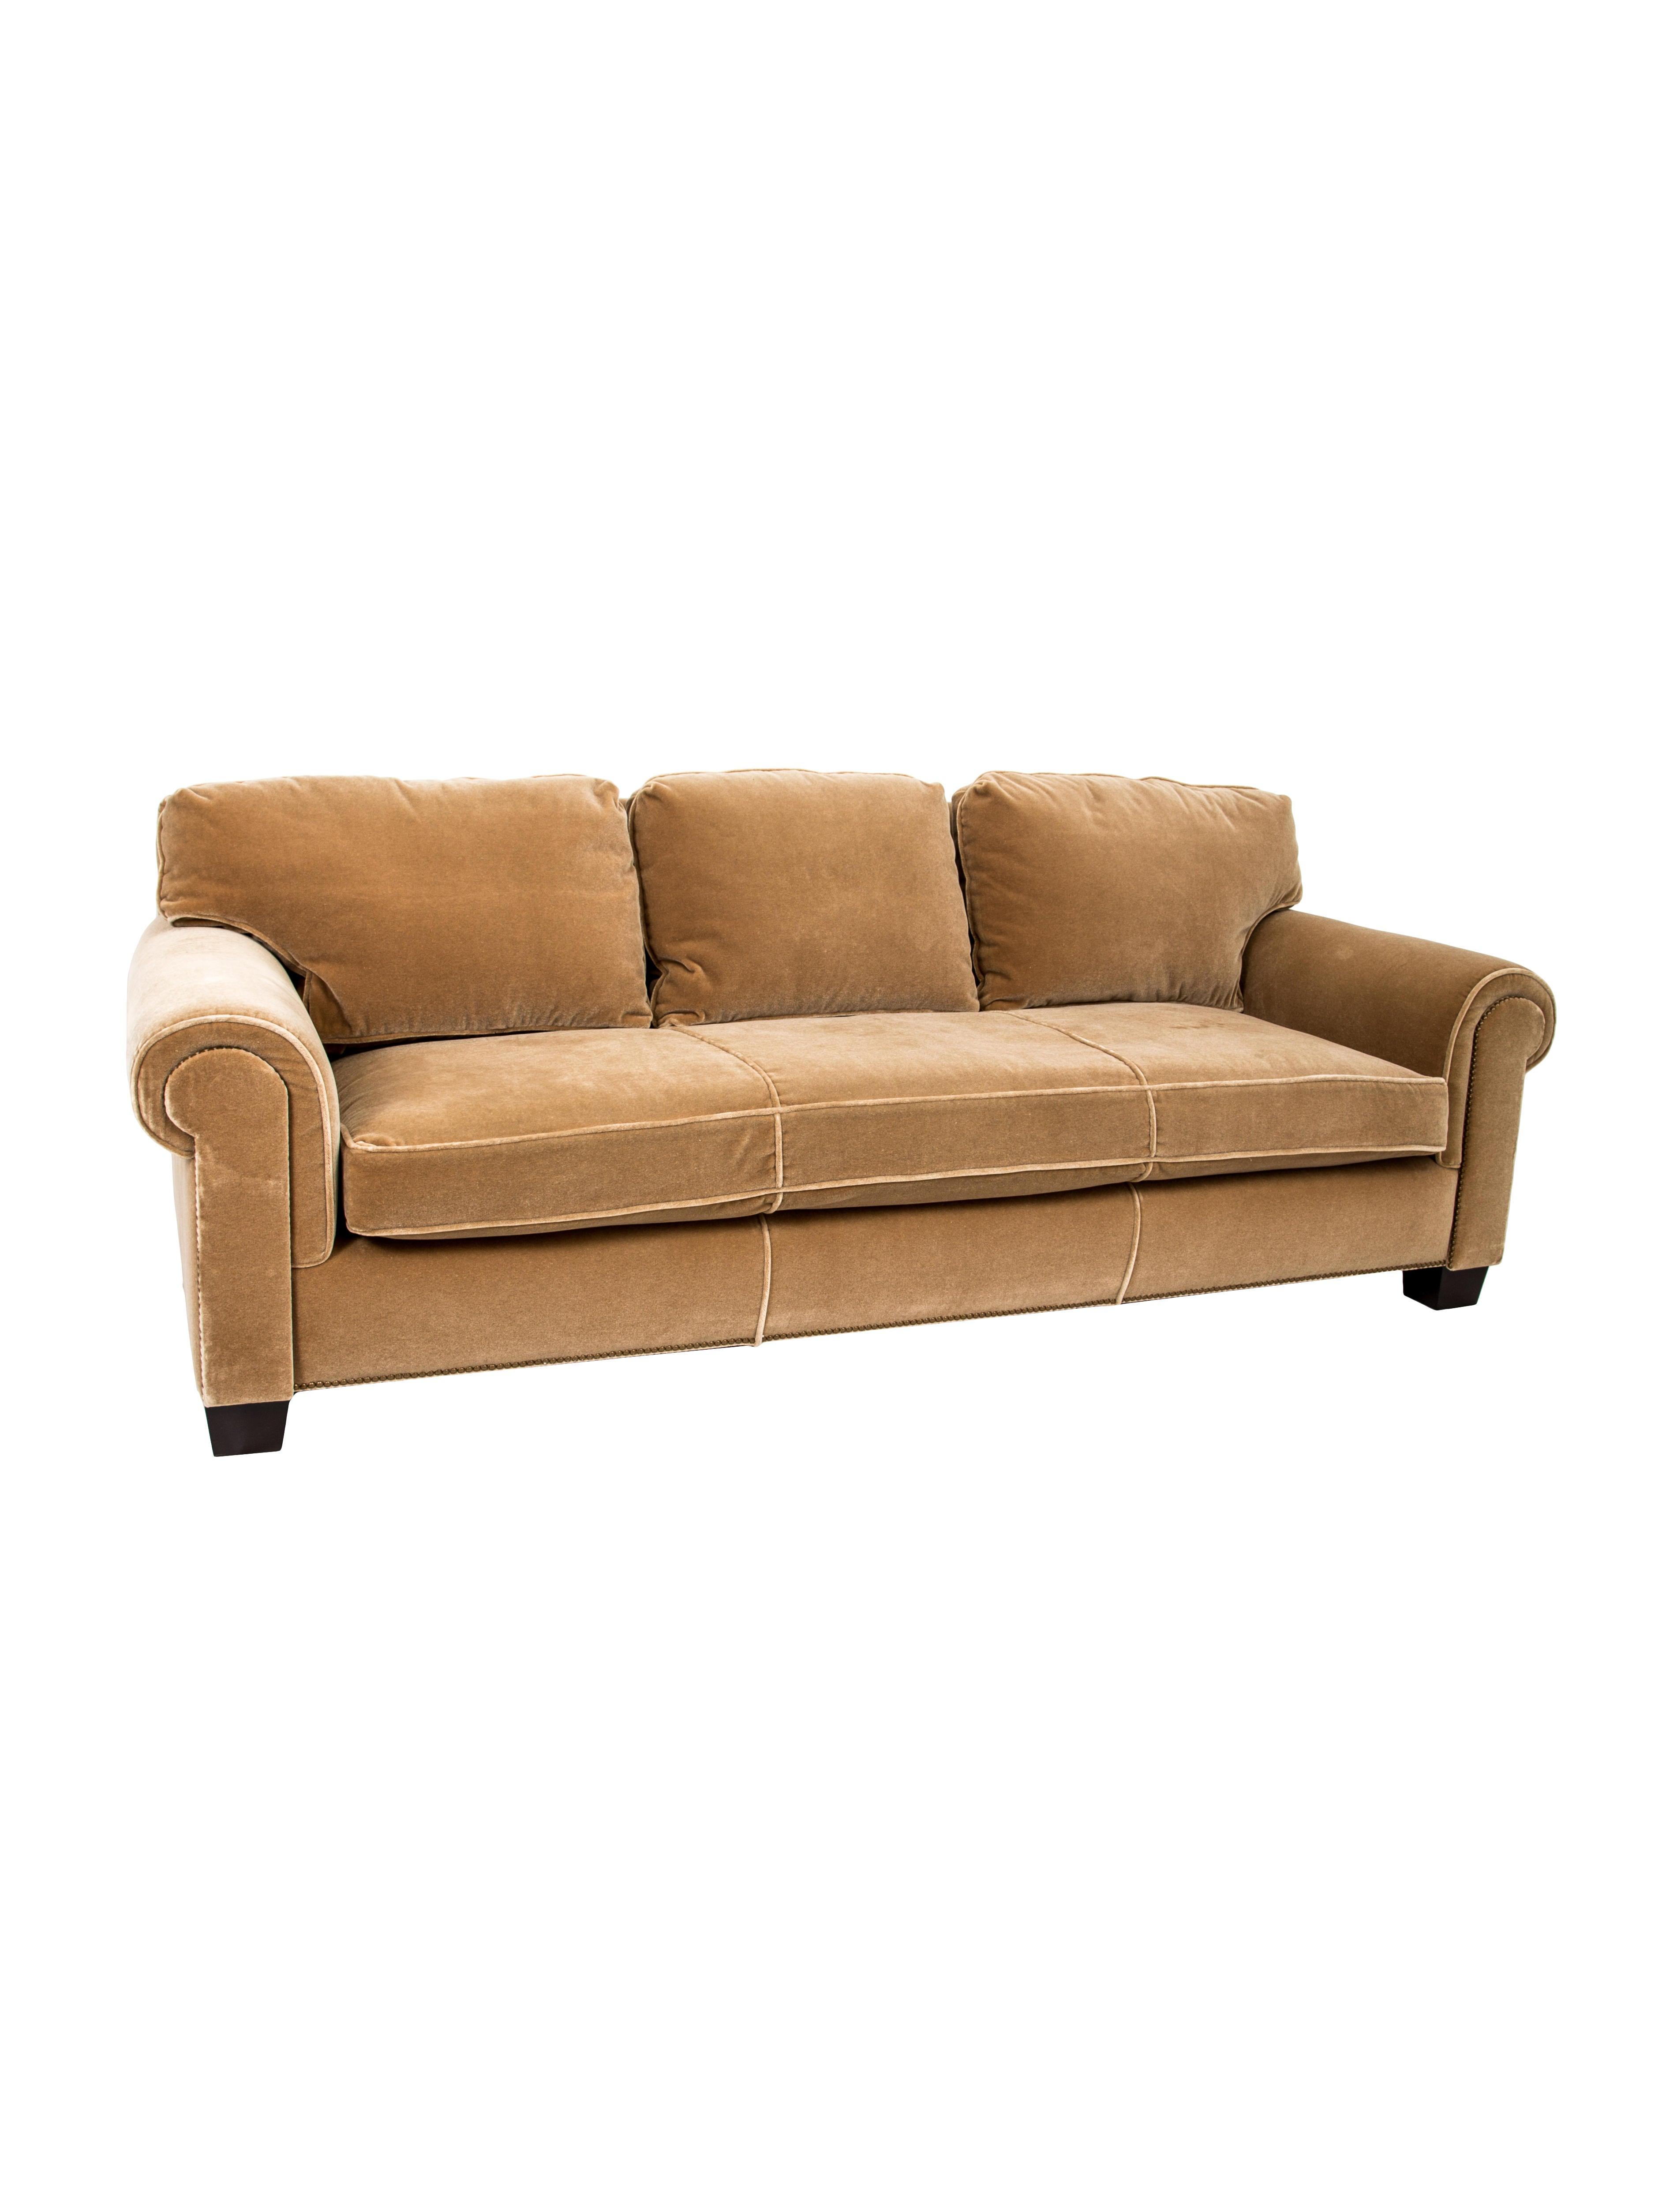 Superb A. Rudin Velvet Three Seat Sofa